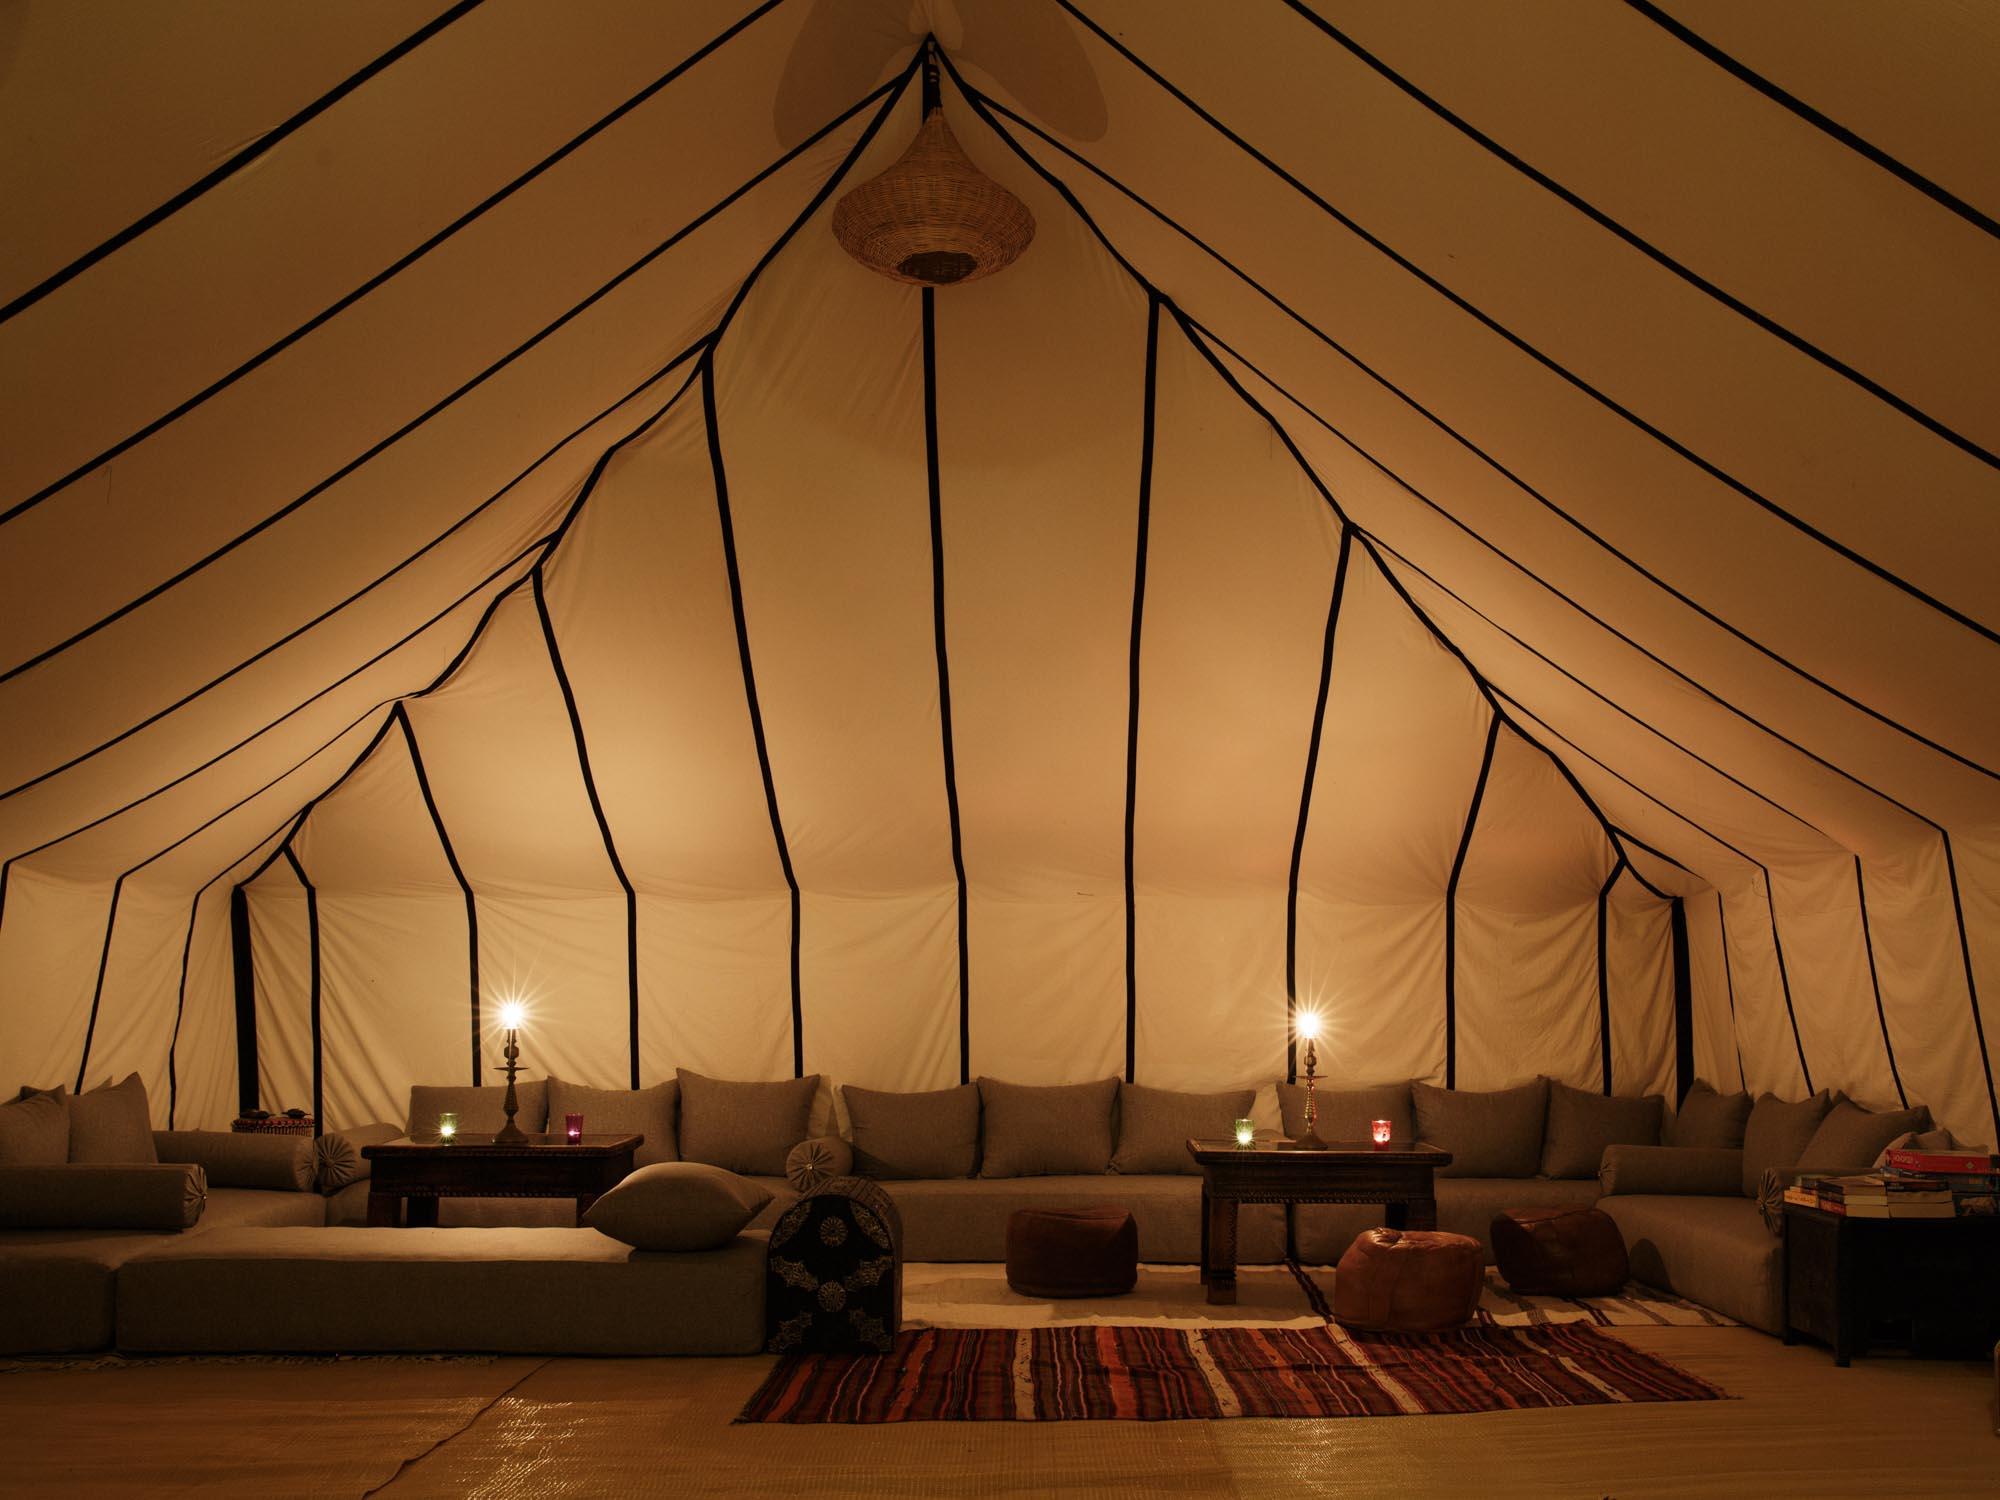 Evening inside the luxury desert camp Morocco lounge